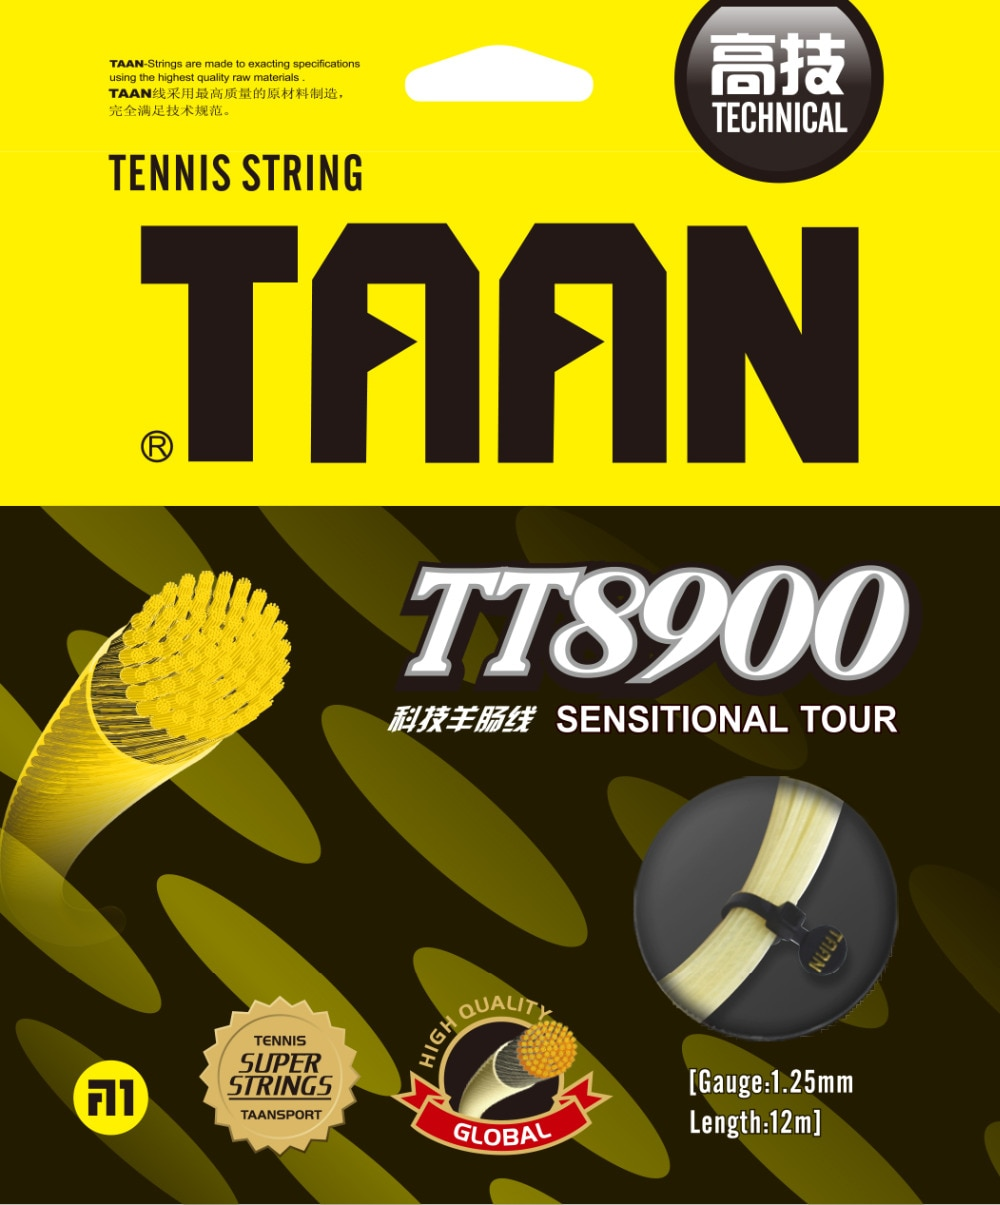 1 ud. TT8900 sensitional tour cuerda de tenis técnica